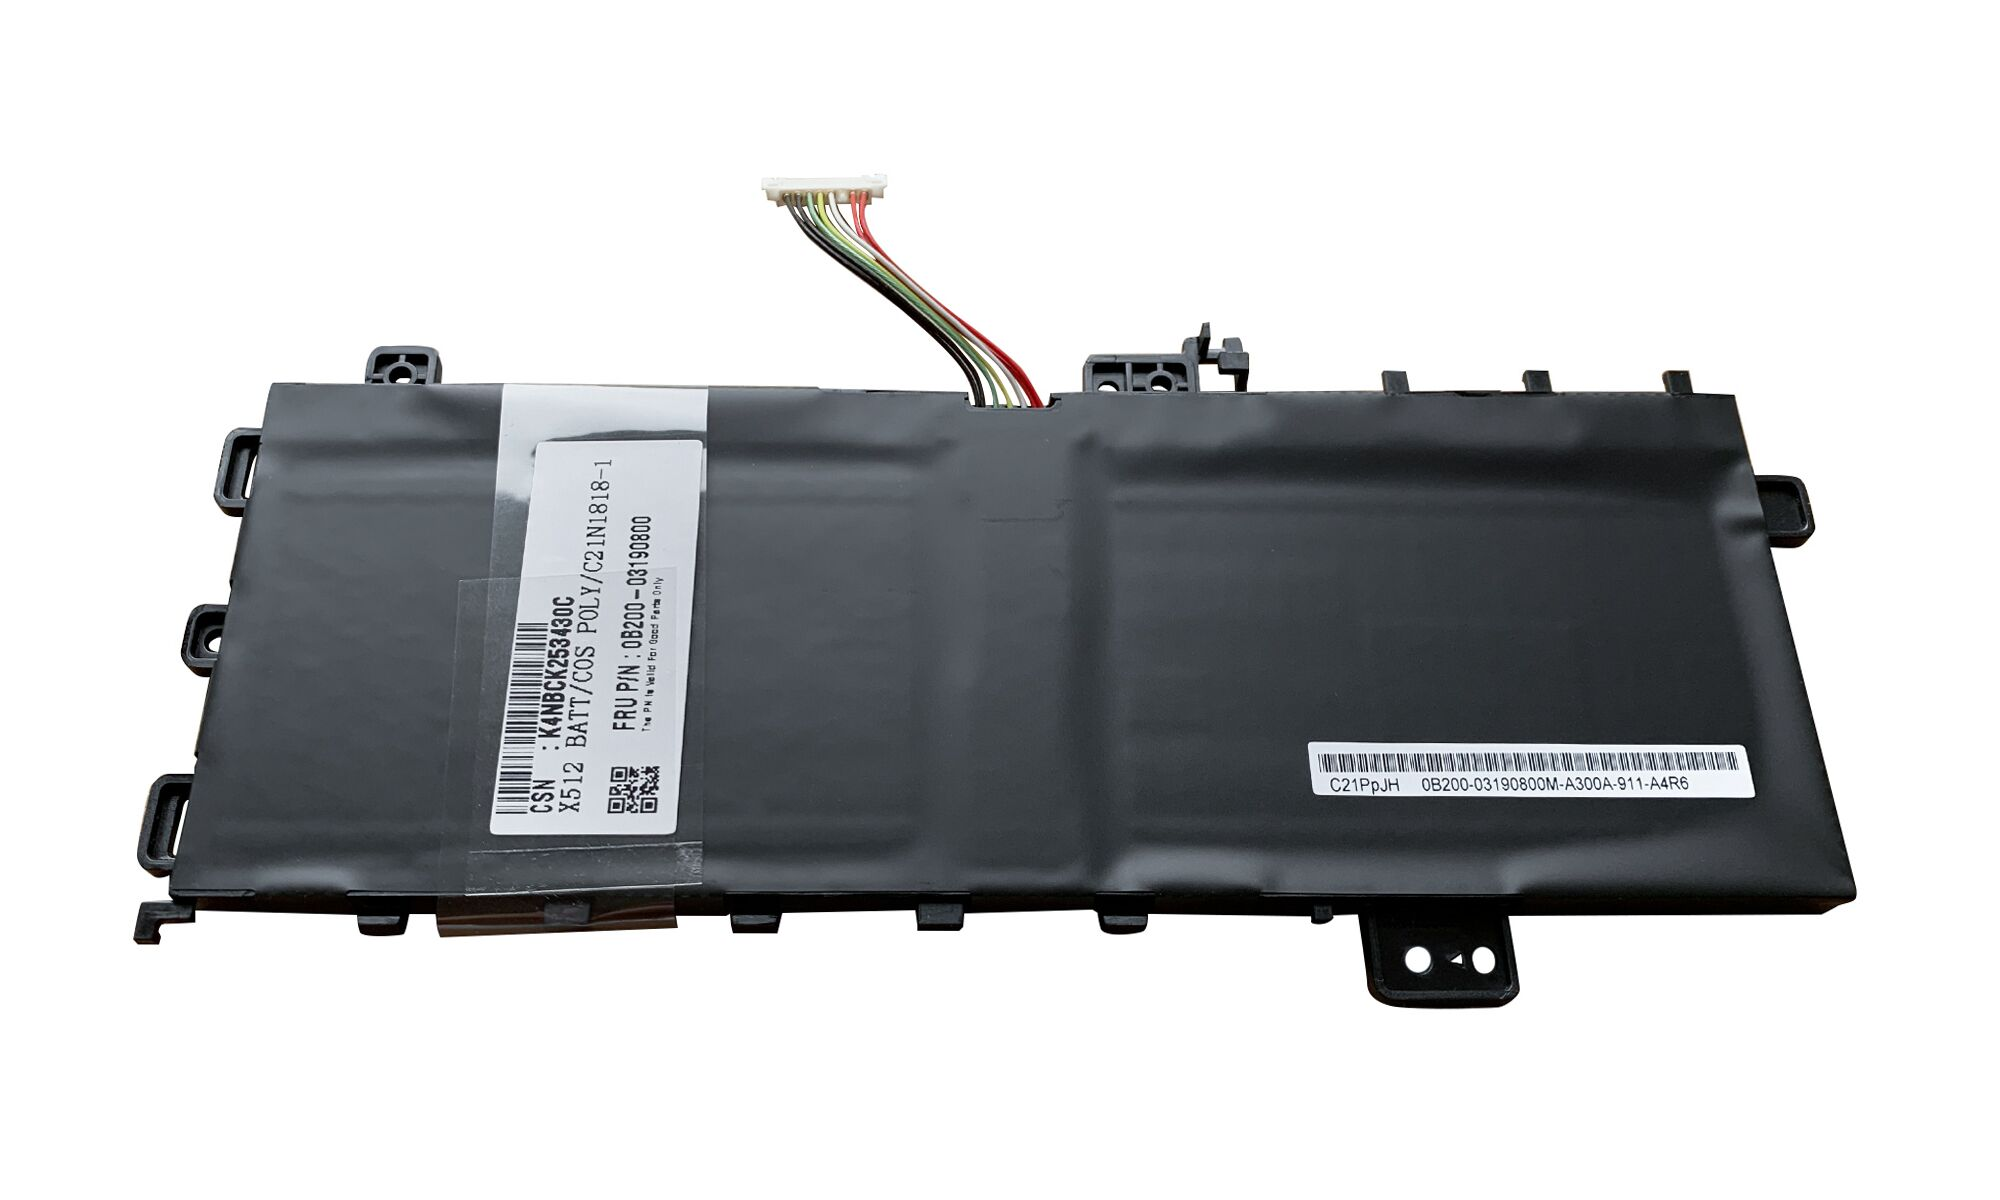 Baterie originala laptop ASUS VivoBook 15 X512DA, X512FB, X512FL, X512FJ, X512FA, X512DK, model C21N1818-1